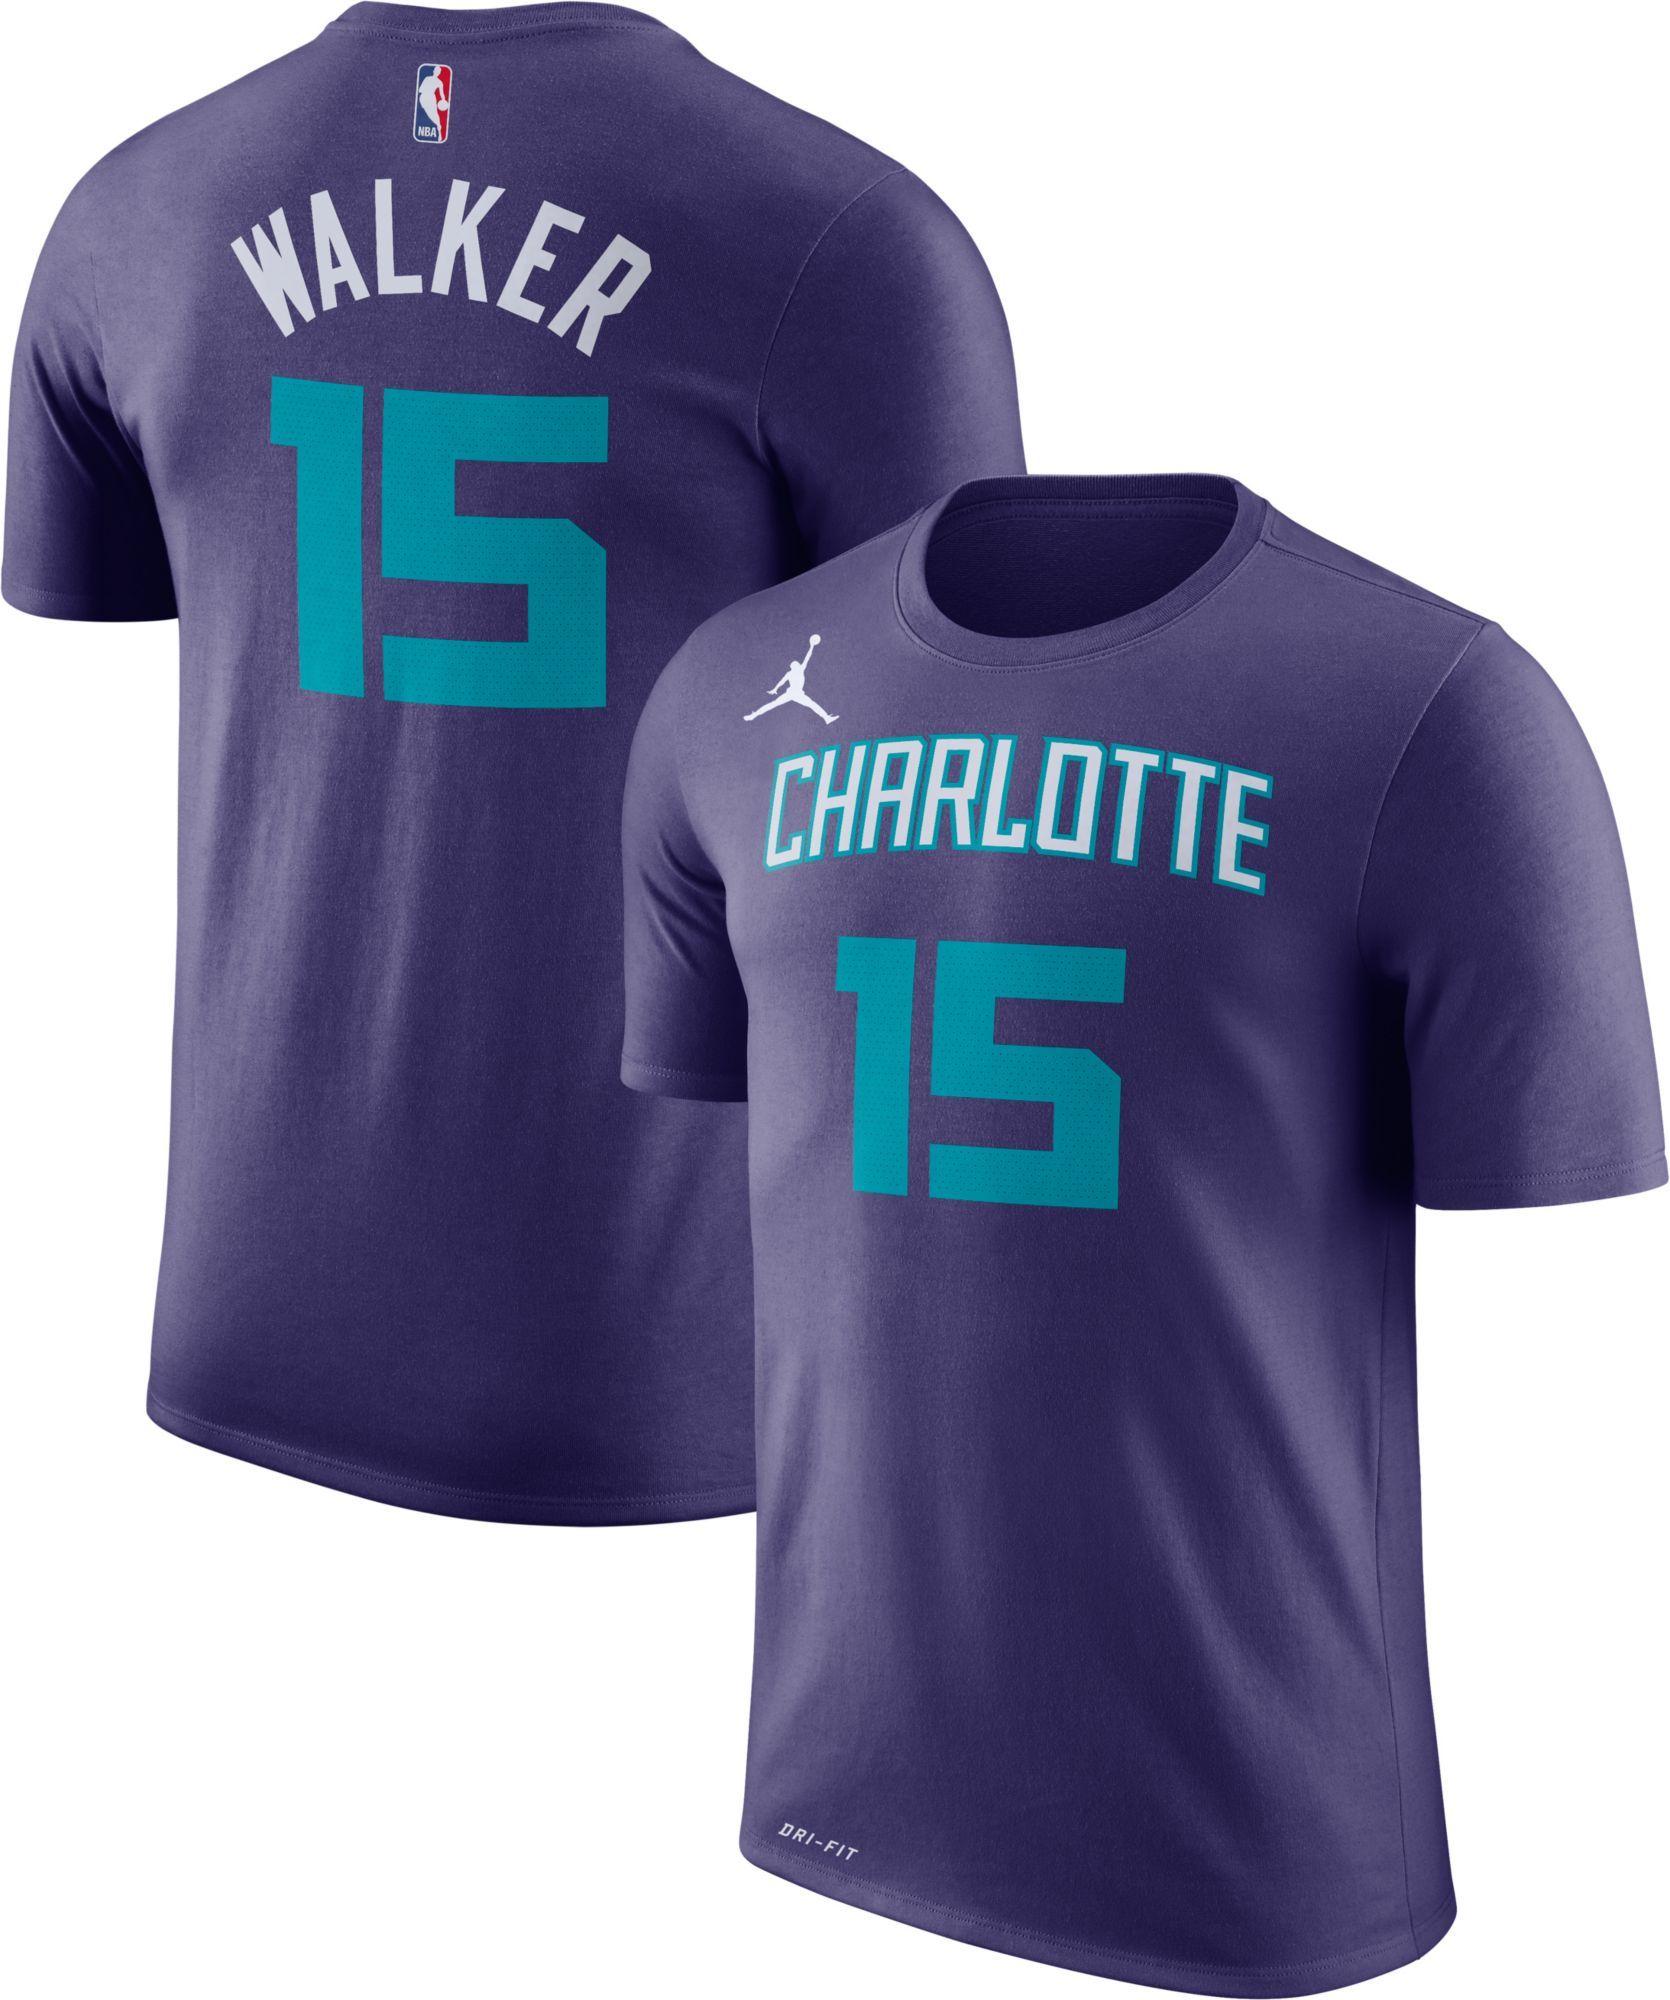 new arrival d7d9a c234b Jordan Youth Charlotte Hornets Kemba Walker  15 Dri-FIT Purple T-Shirt,  Boy s, Size  Medium